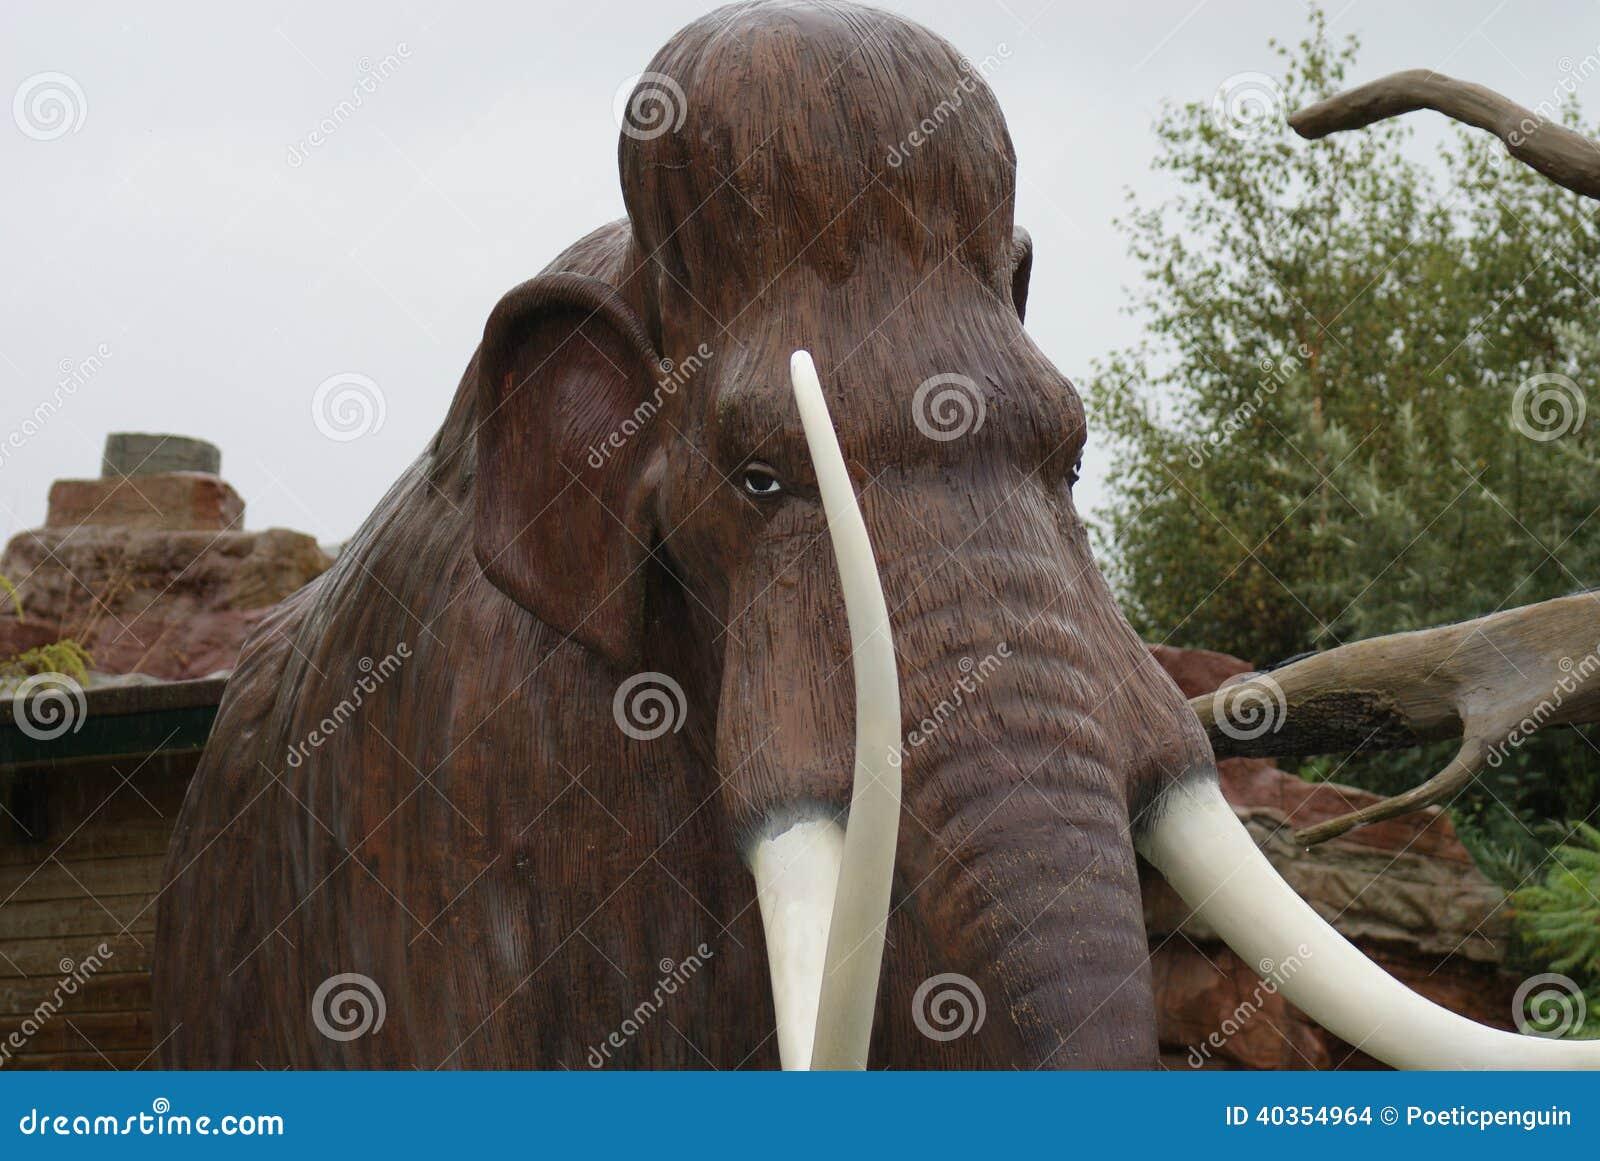 Mammut Evolution